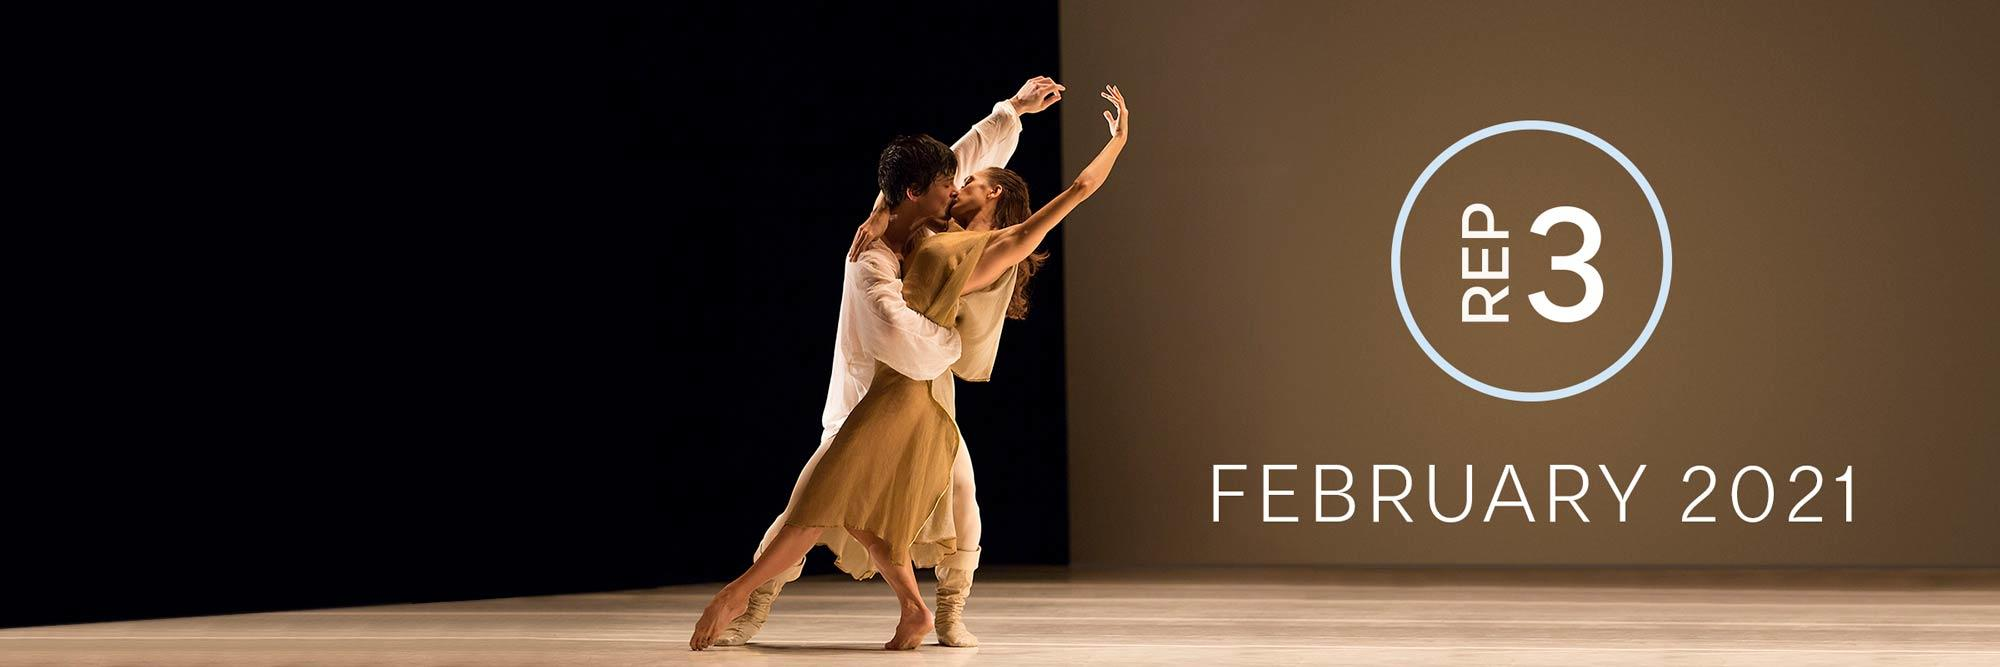 Rep 3, February 2021: Noelani Pantastico and James Moore dancing in Jean-Christophe Malliot's Romeo et Julliette.